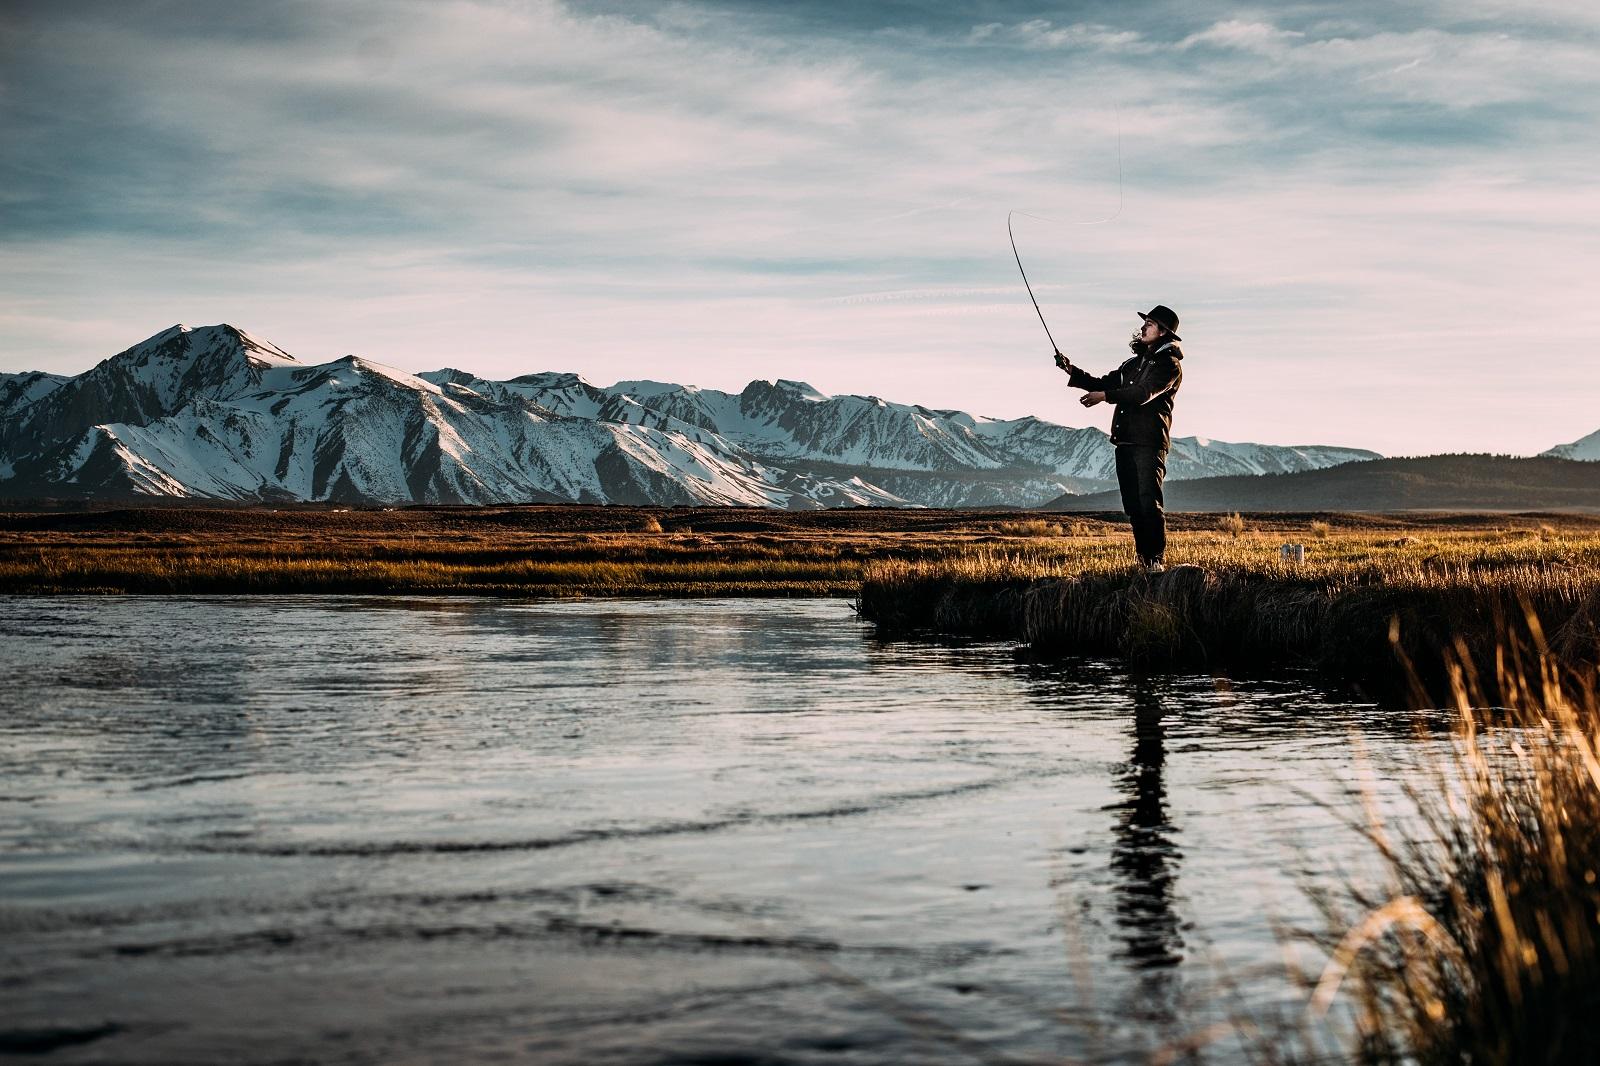 Allmänt om fiske